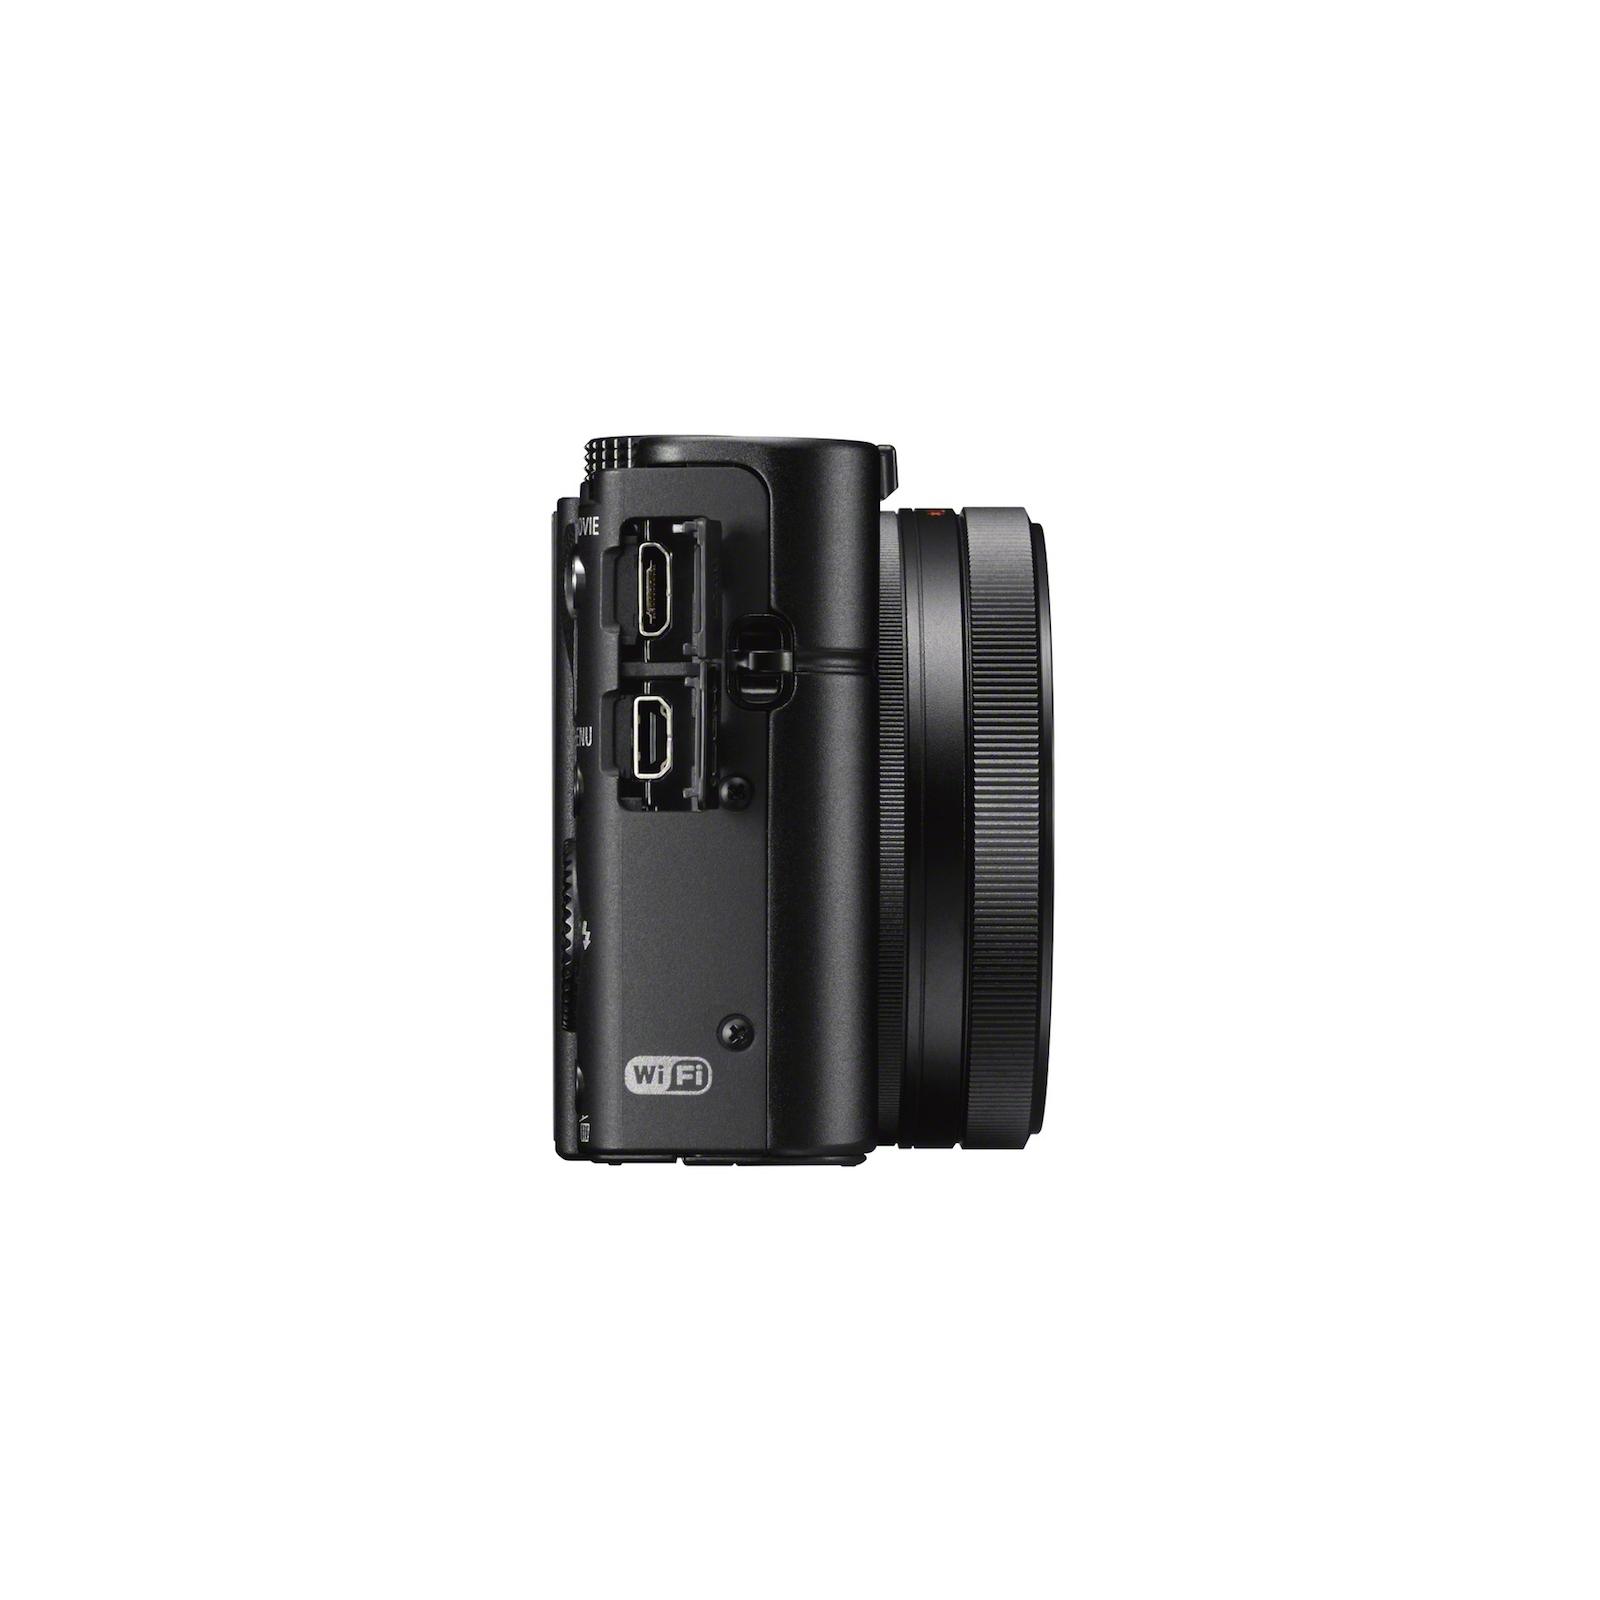 Цифровий фотоапарат SONY Cyber-shot DSC-RX100 Mark III (DSCRX100M3.RU3) зображення 7